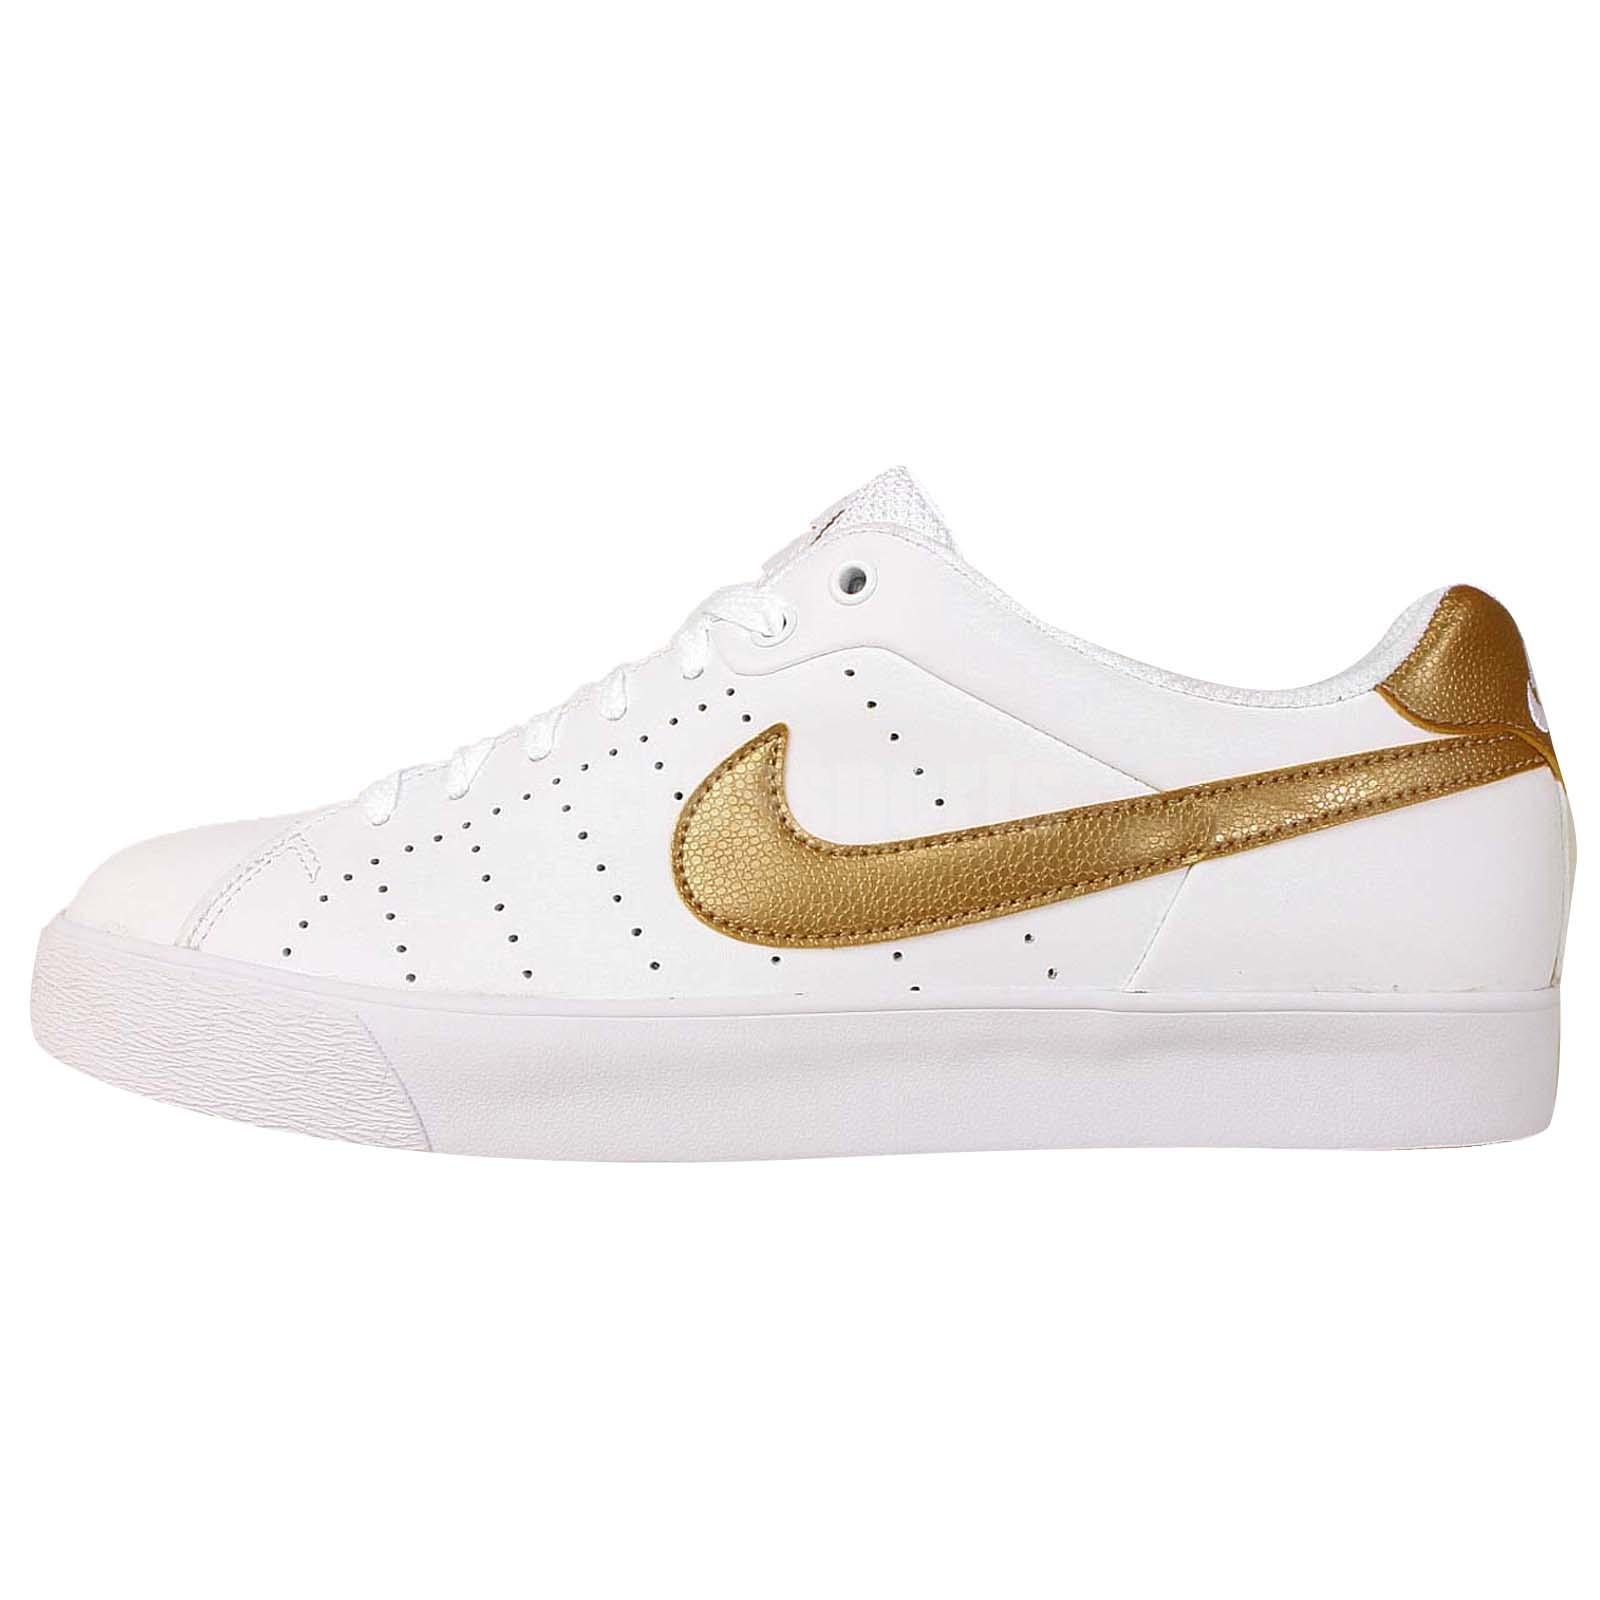 nike court tour white gold 2014 mens classic tennis casual